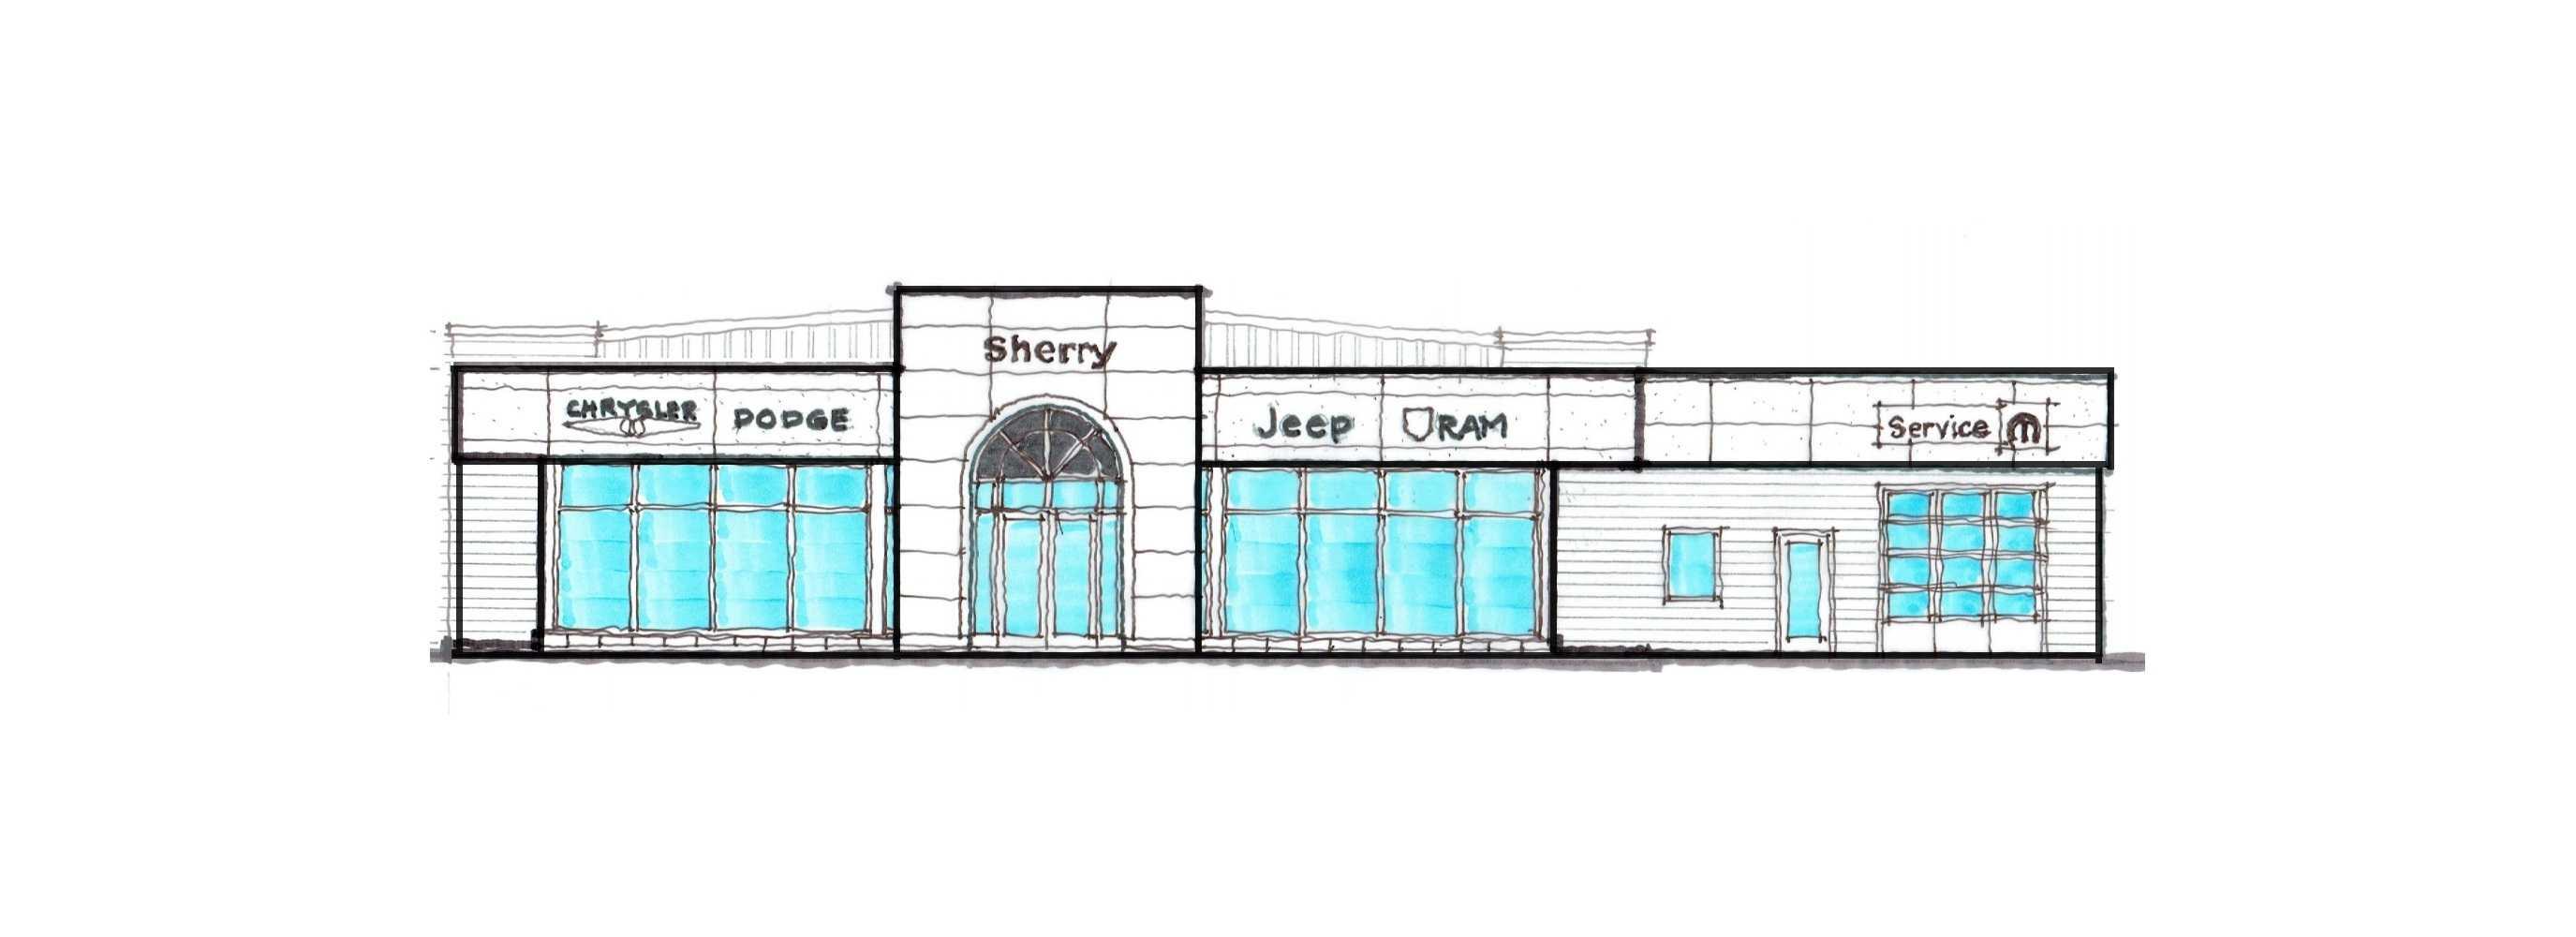 Paul-Sherry-Building-Design-blank